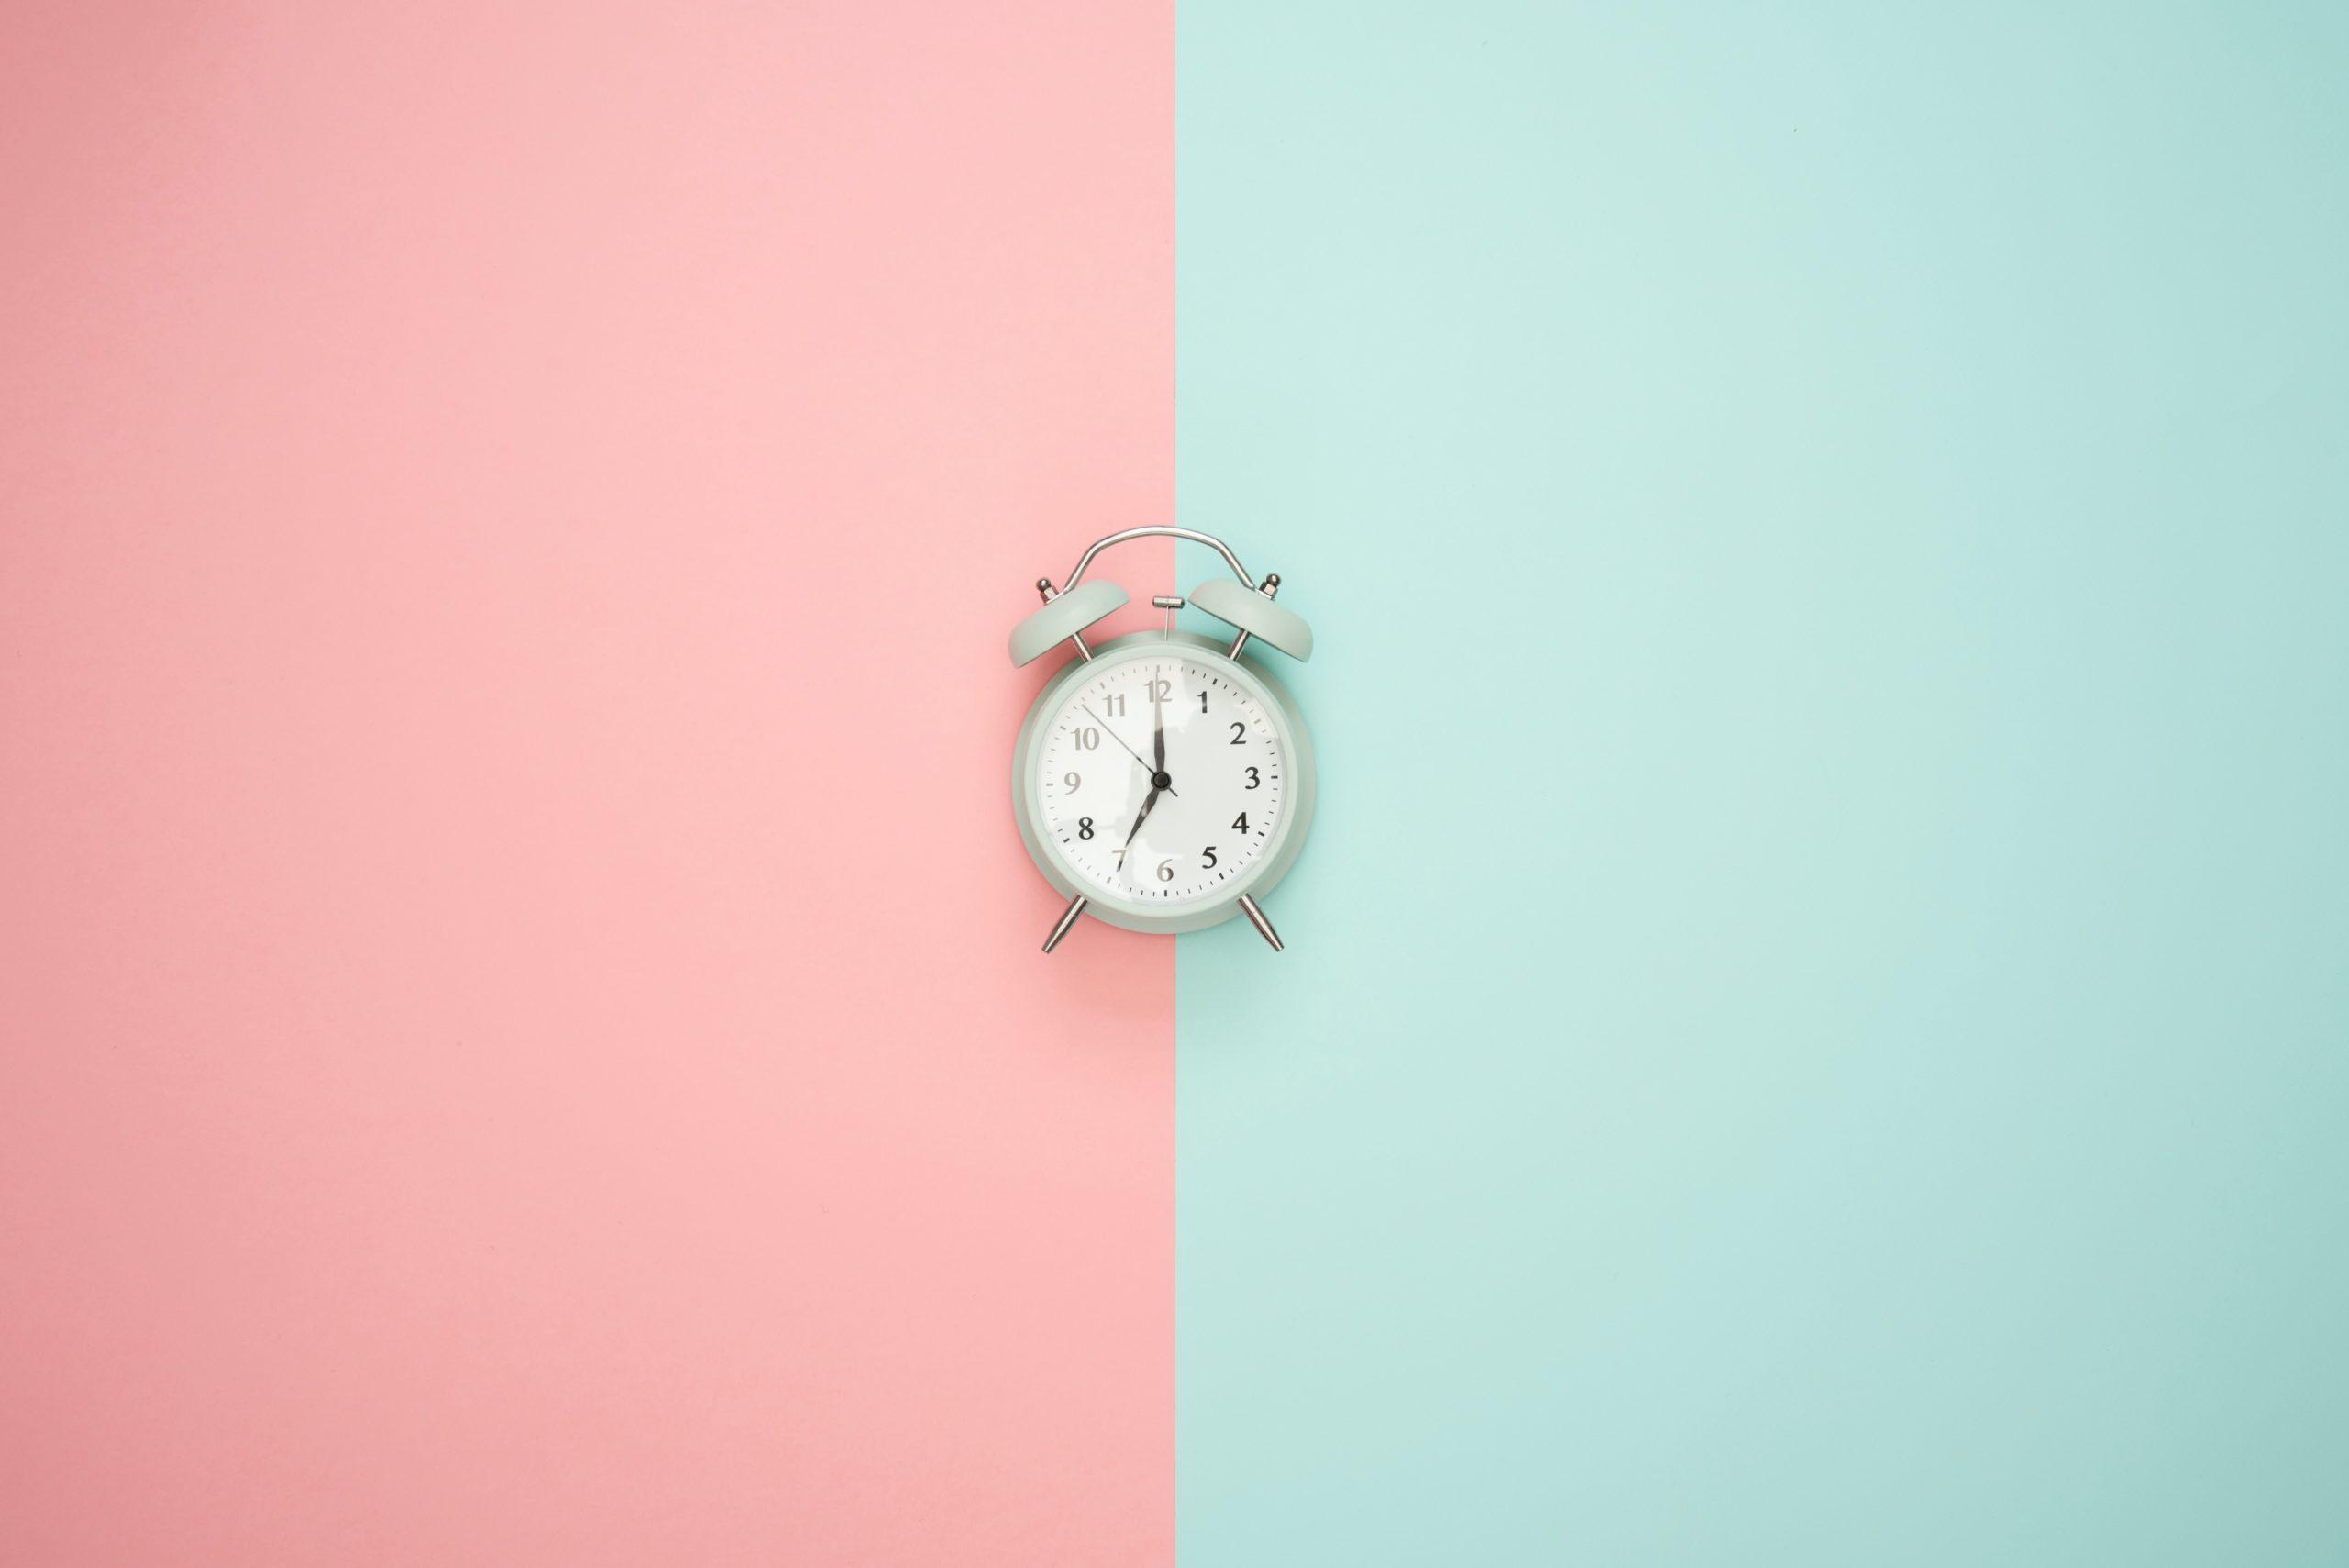 The habit loop: Reshaping 'bad' habits